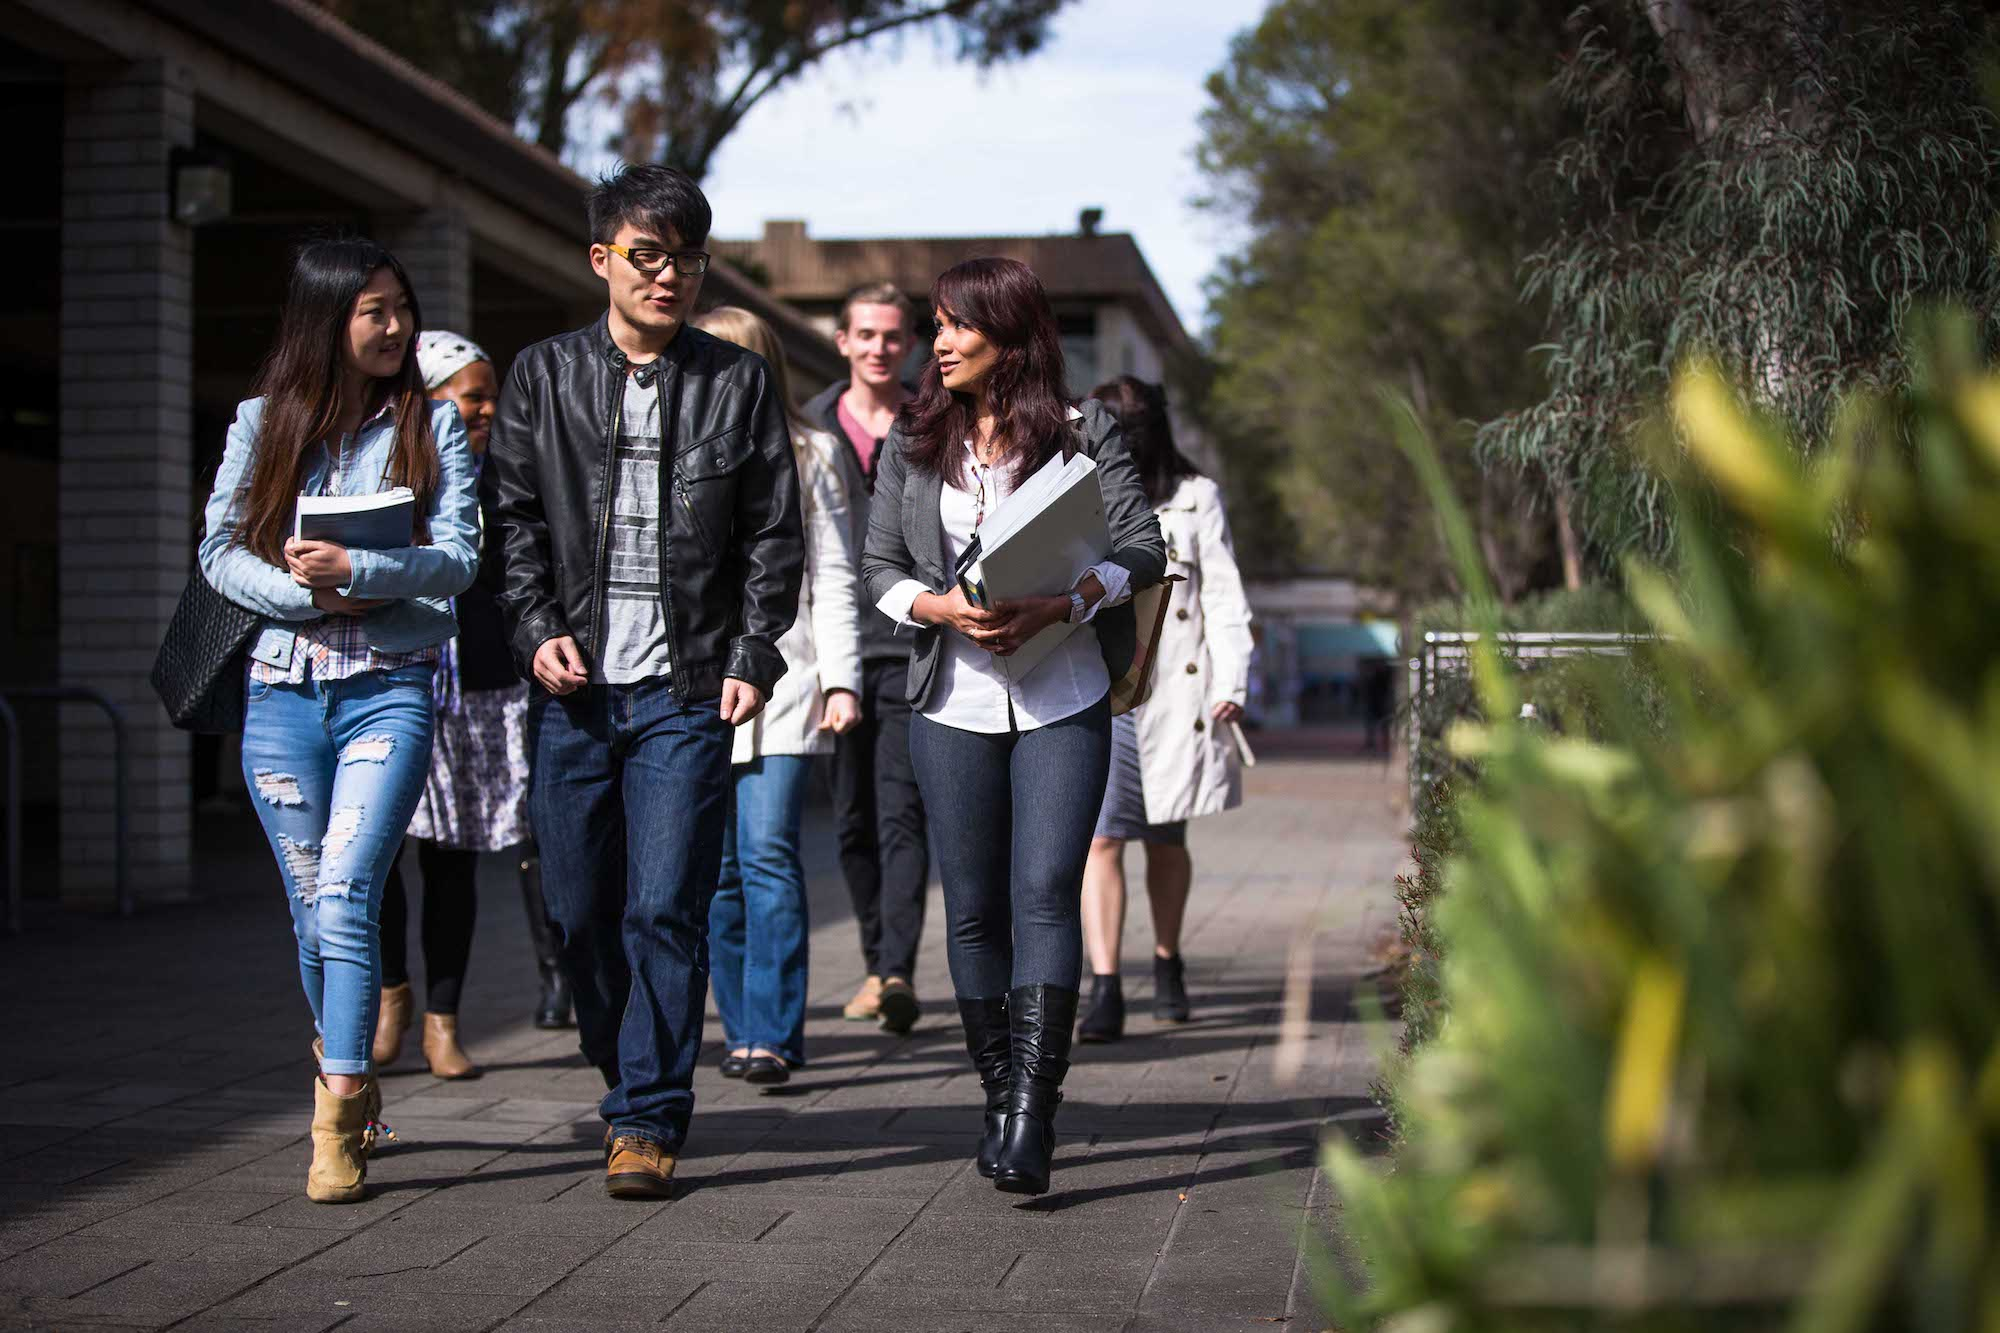 University of Canberra 3